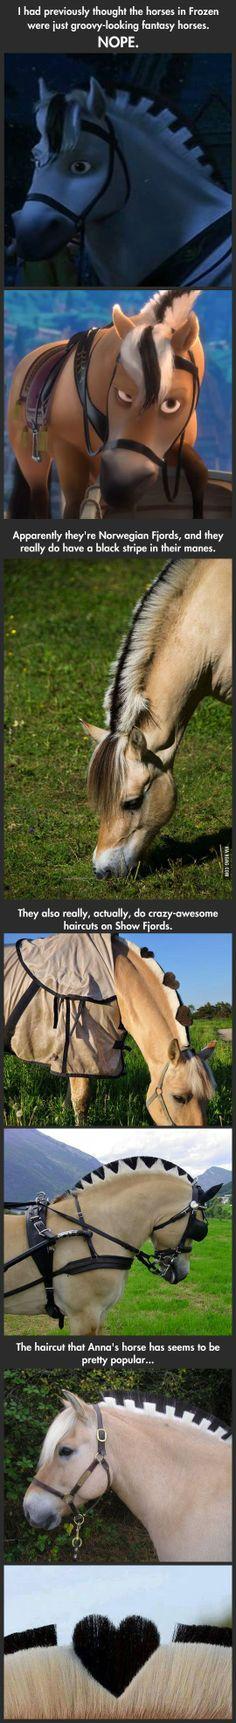 Frozen horses in real life